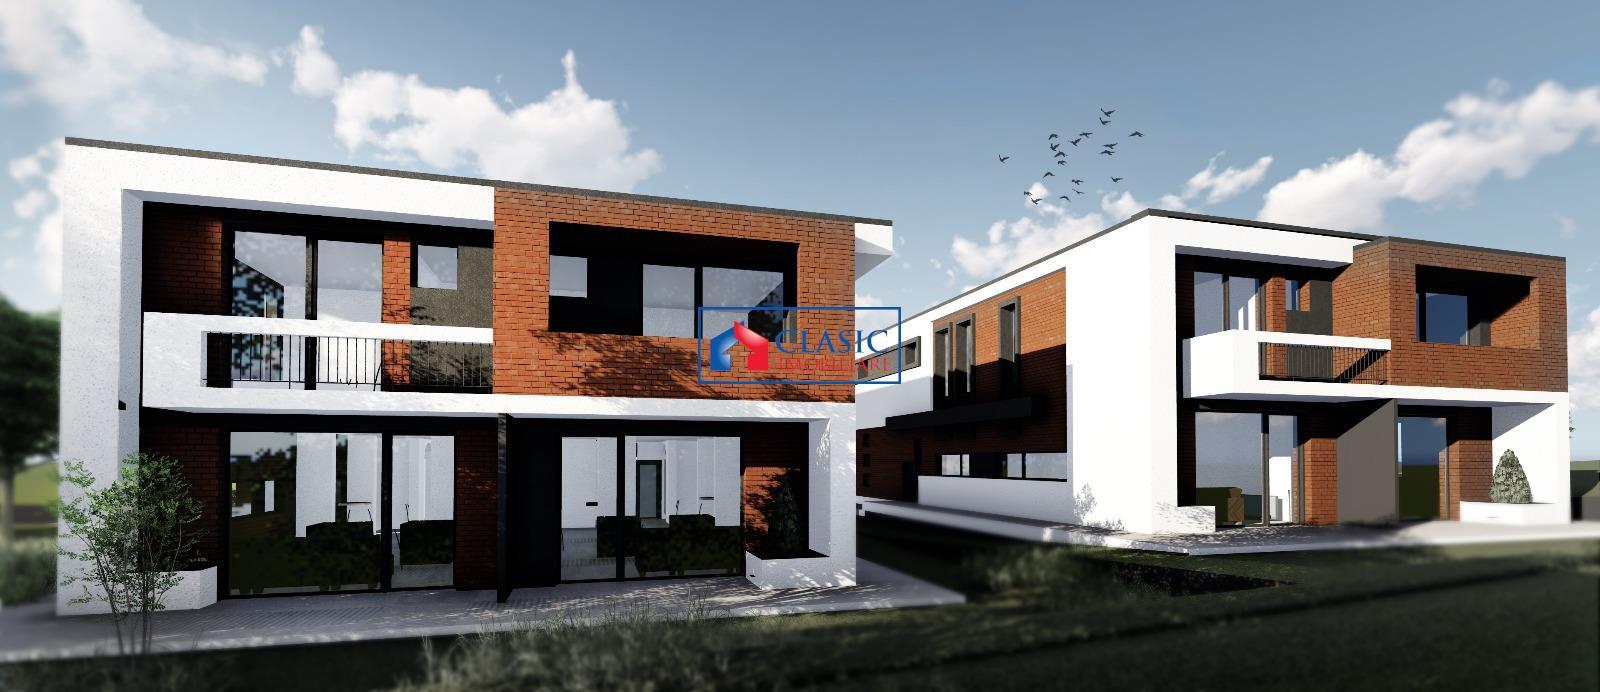 Parte duplex constructie noua de vanzare, cartier Europa, Cluj Napoca